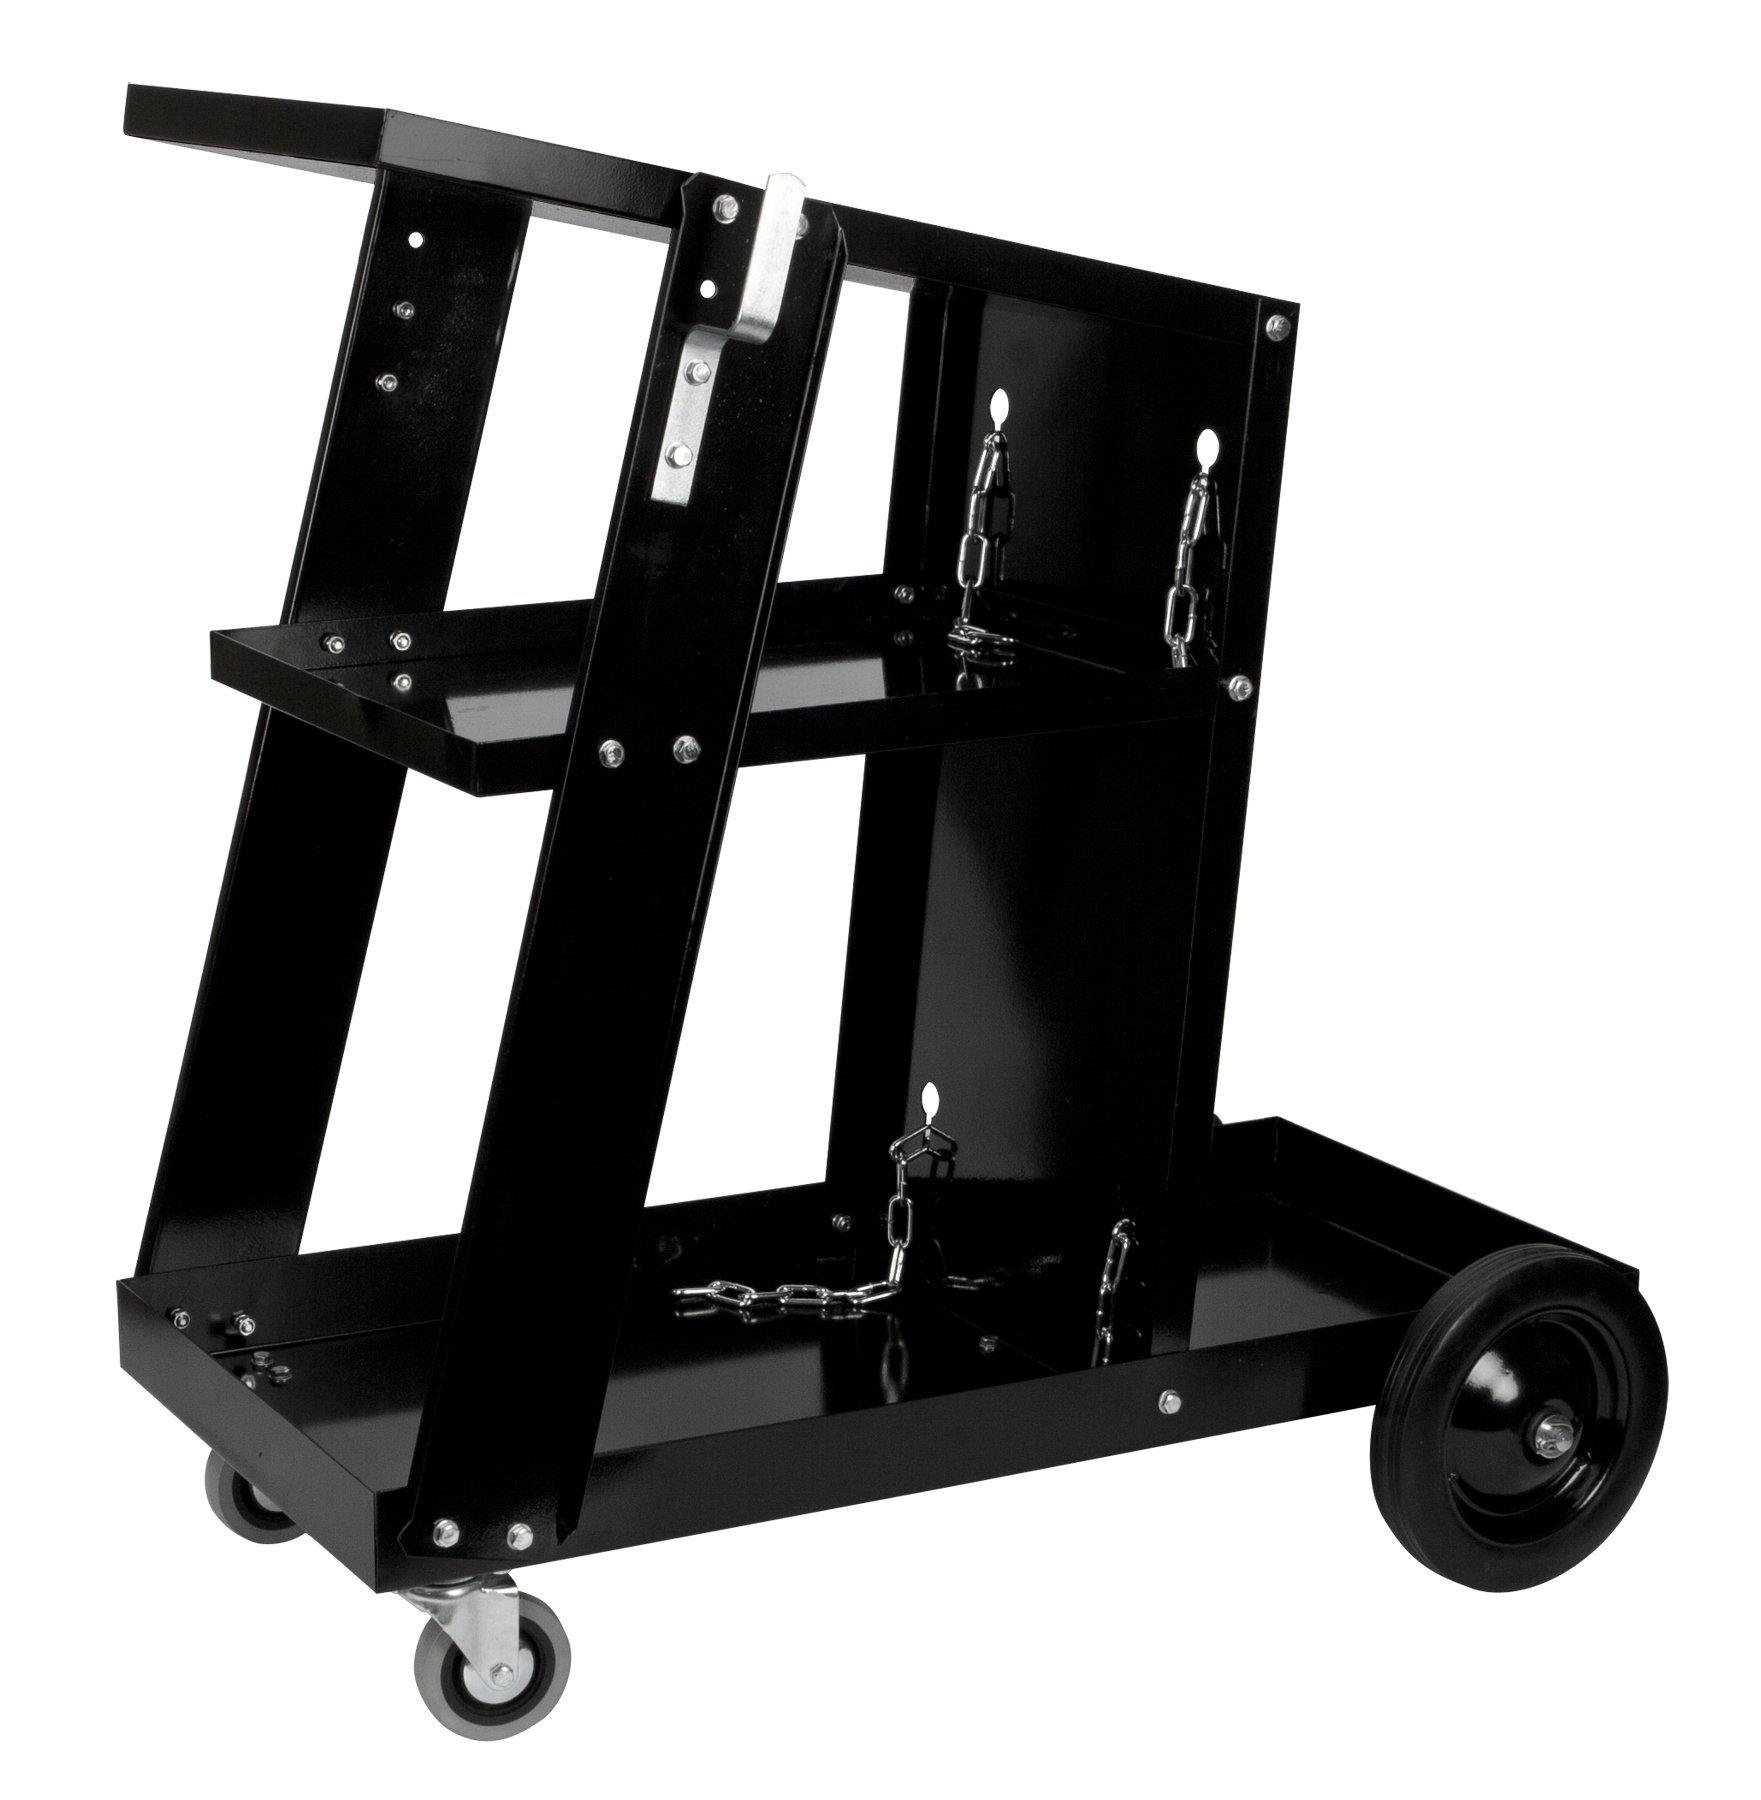 Performance Tool W53992 Welding Cart, Universal, Black Universal Welding Cart by Performance Tool (Image #1)